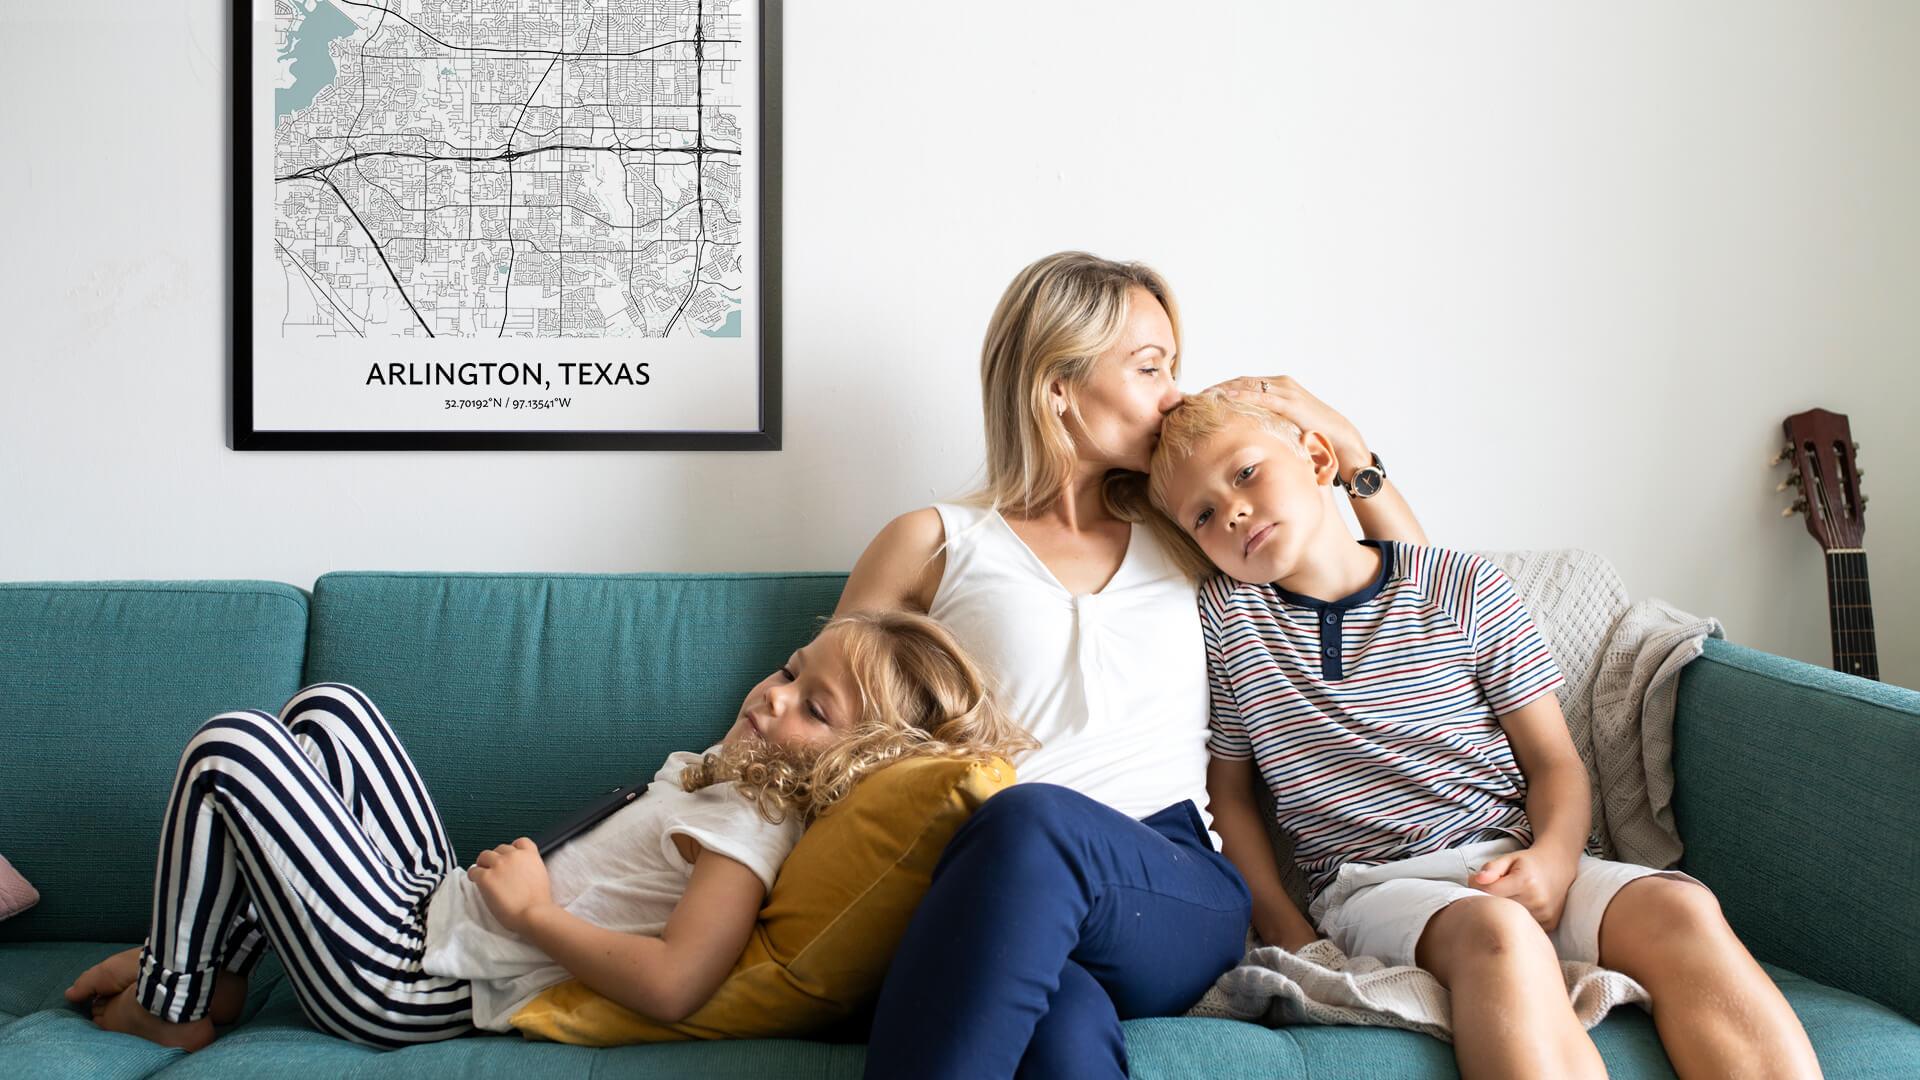 Arlington Texas map poster